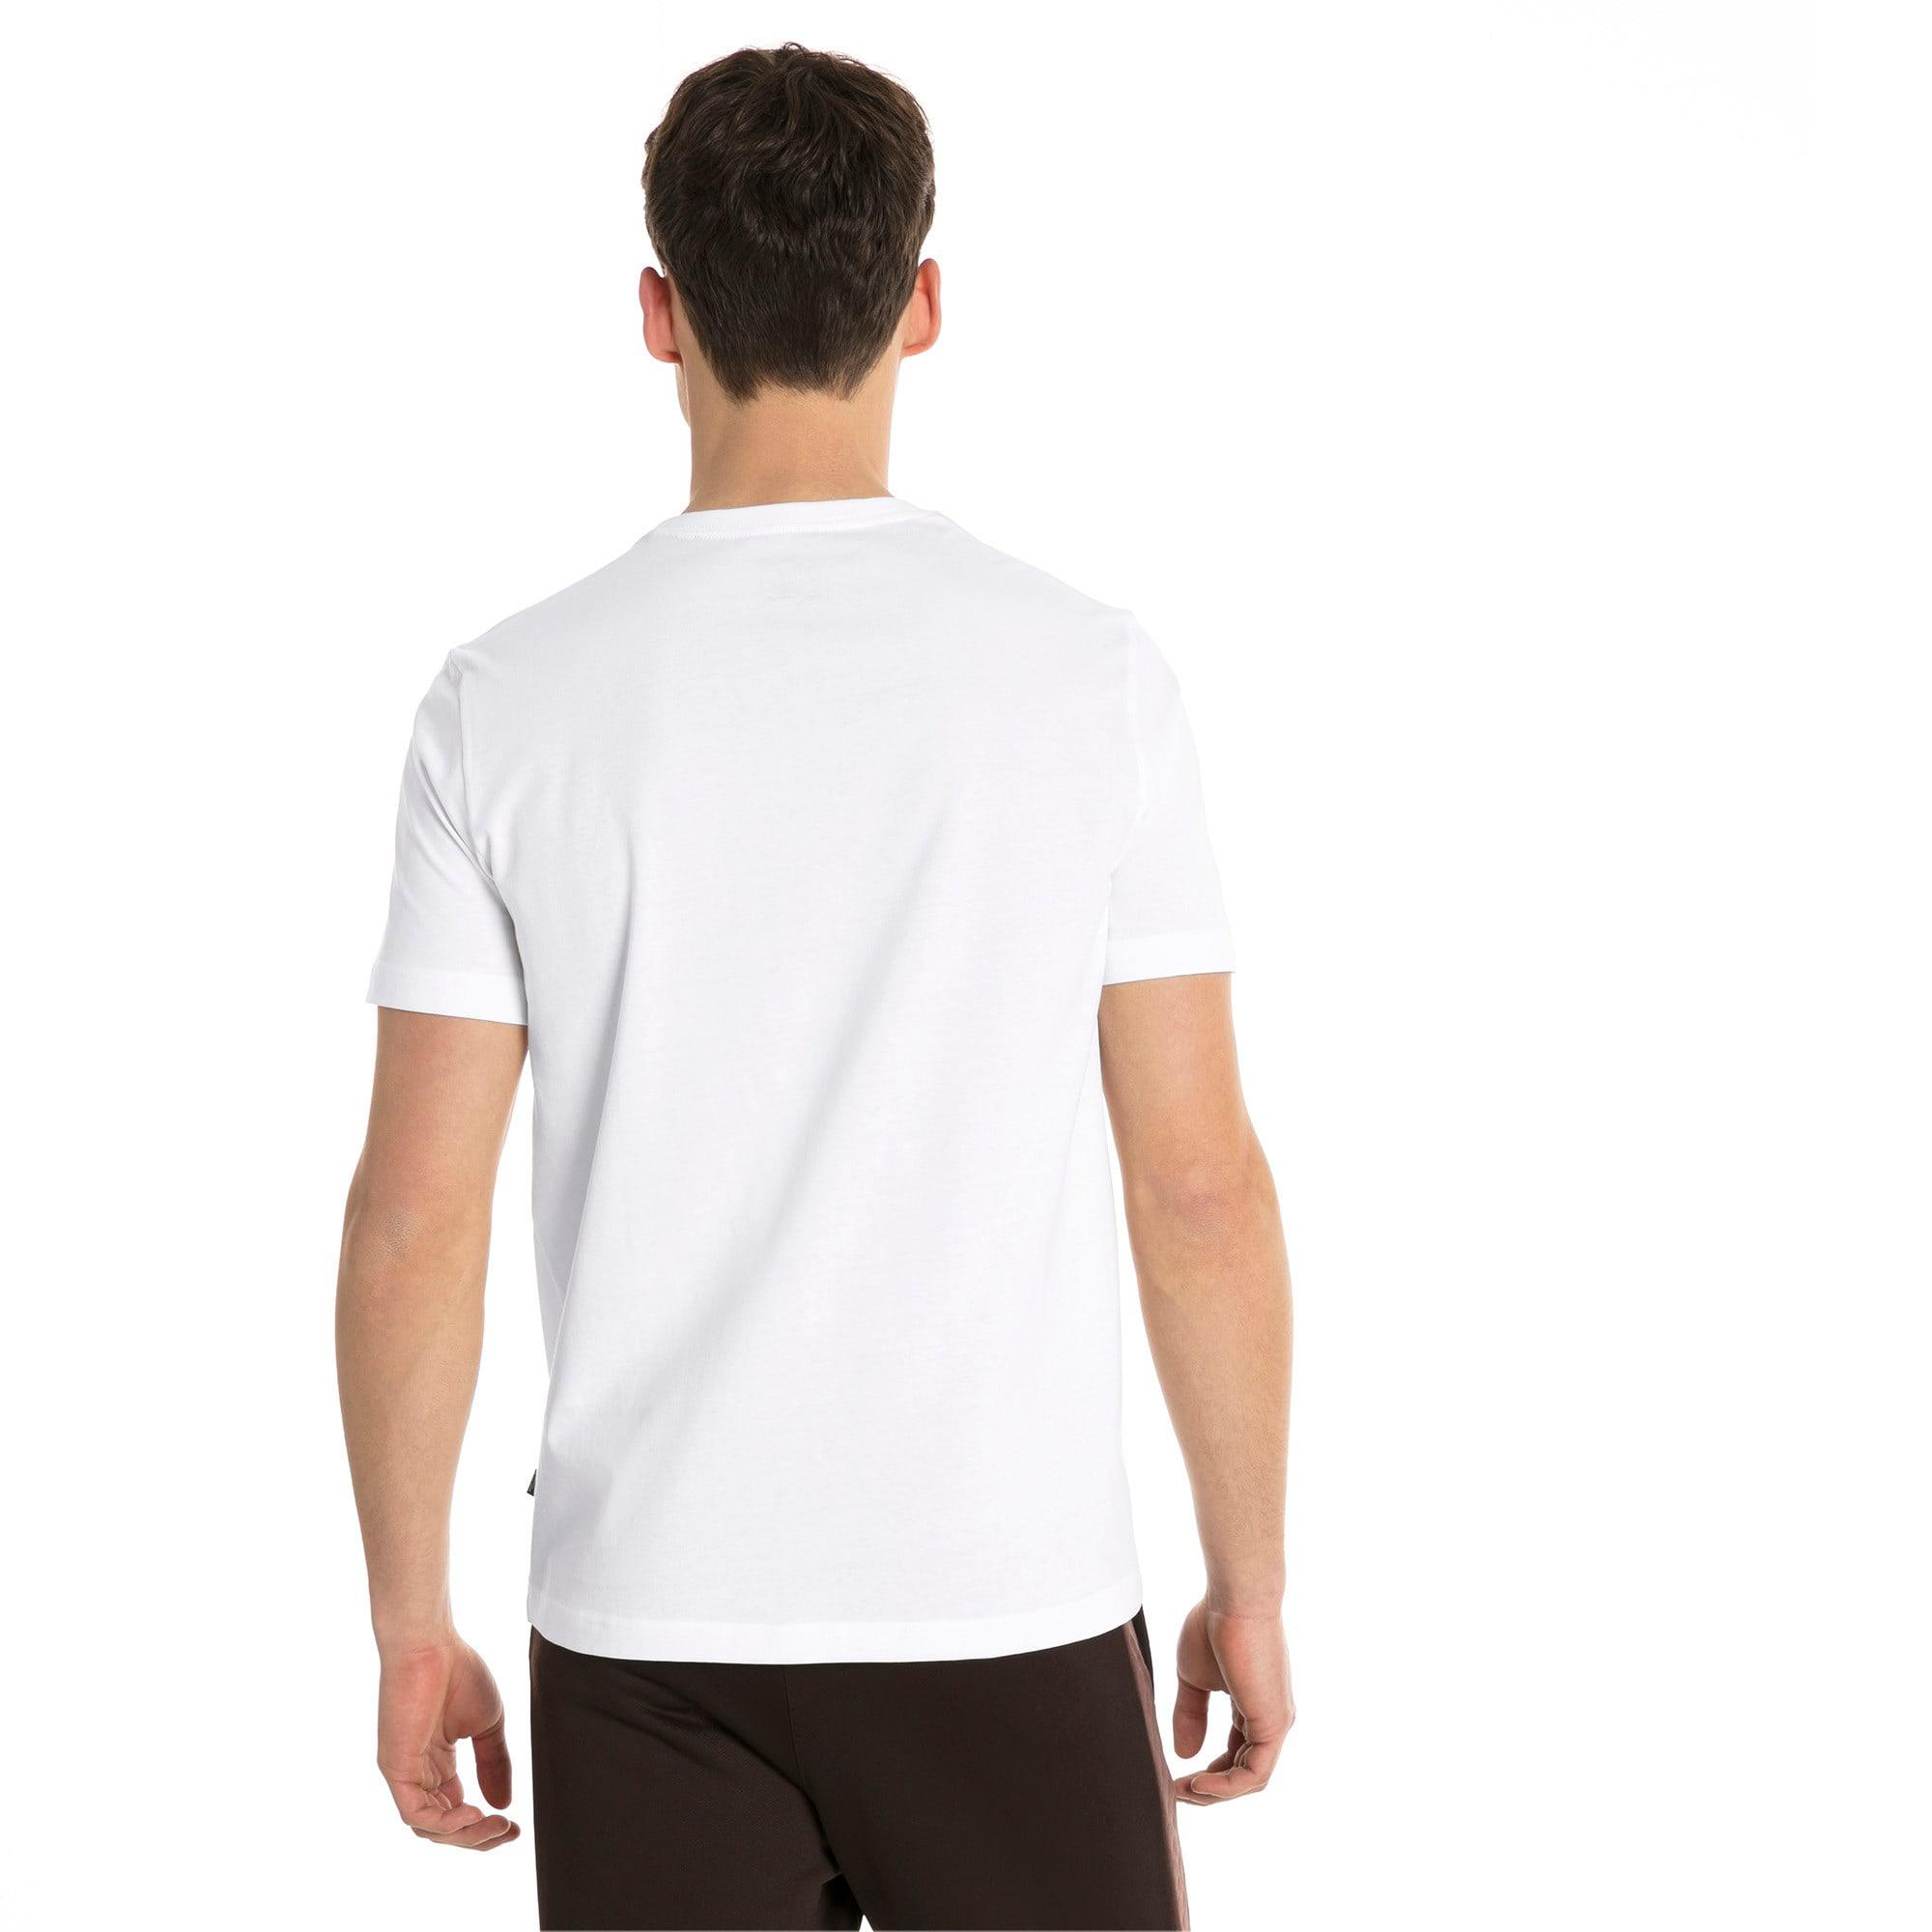 Thumbnail 2 of T-shirt a maniche corte Essentials uomo, Puma White, medium